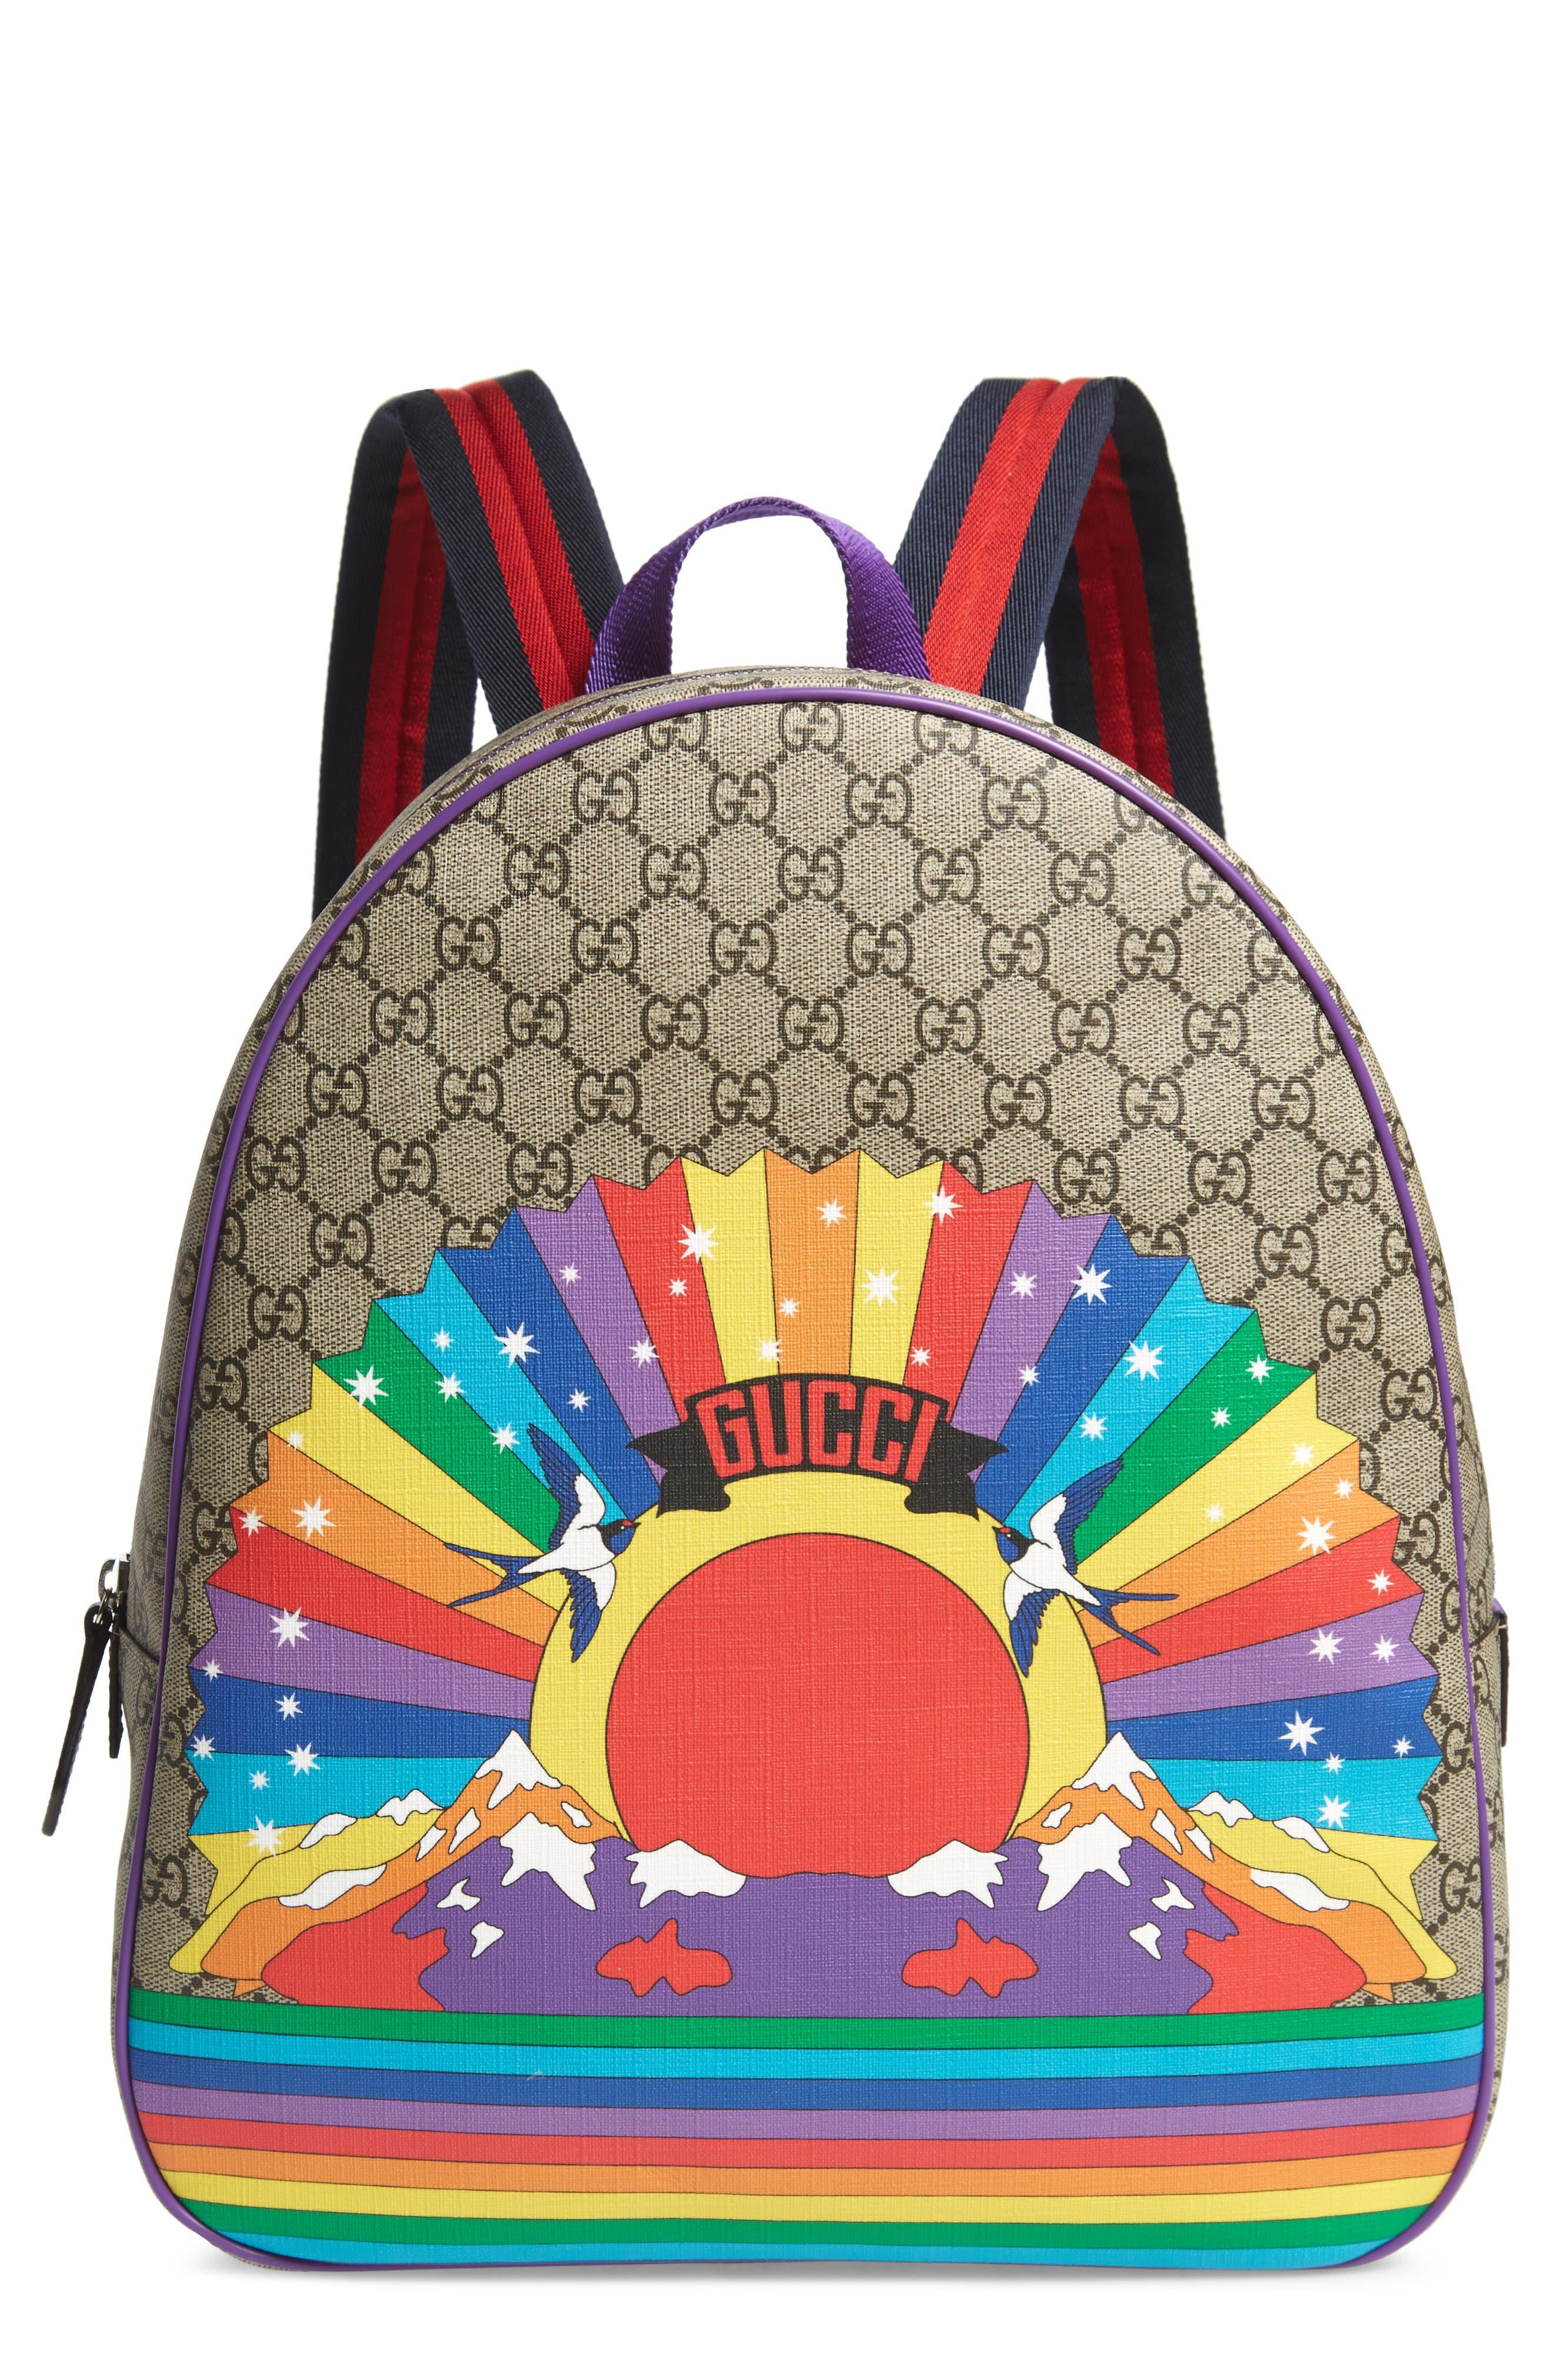 GUCCI, Junior Logo Backpack, Main thumbnail 1, color, BEIGE MULTI